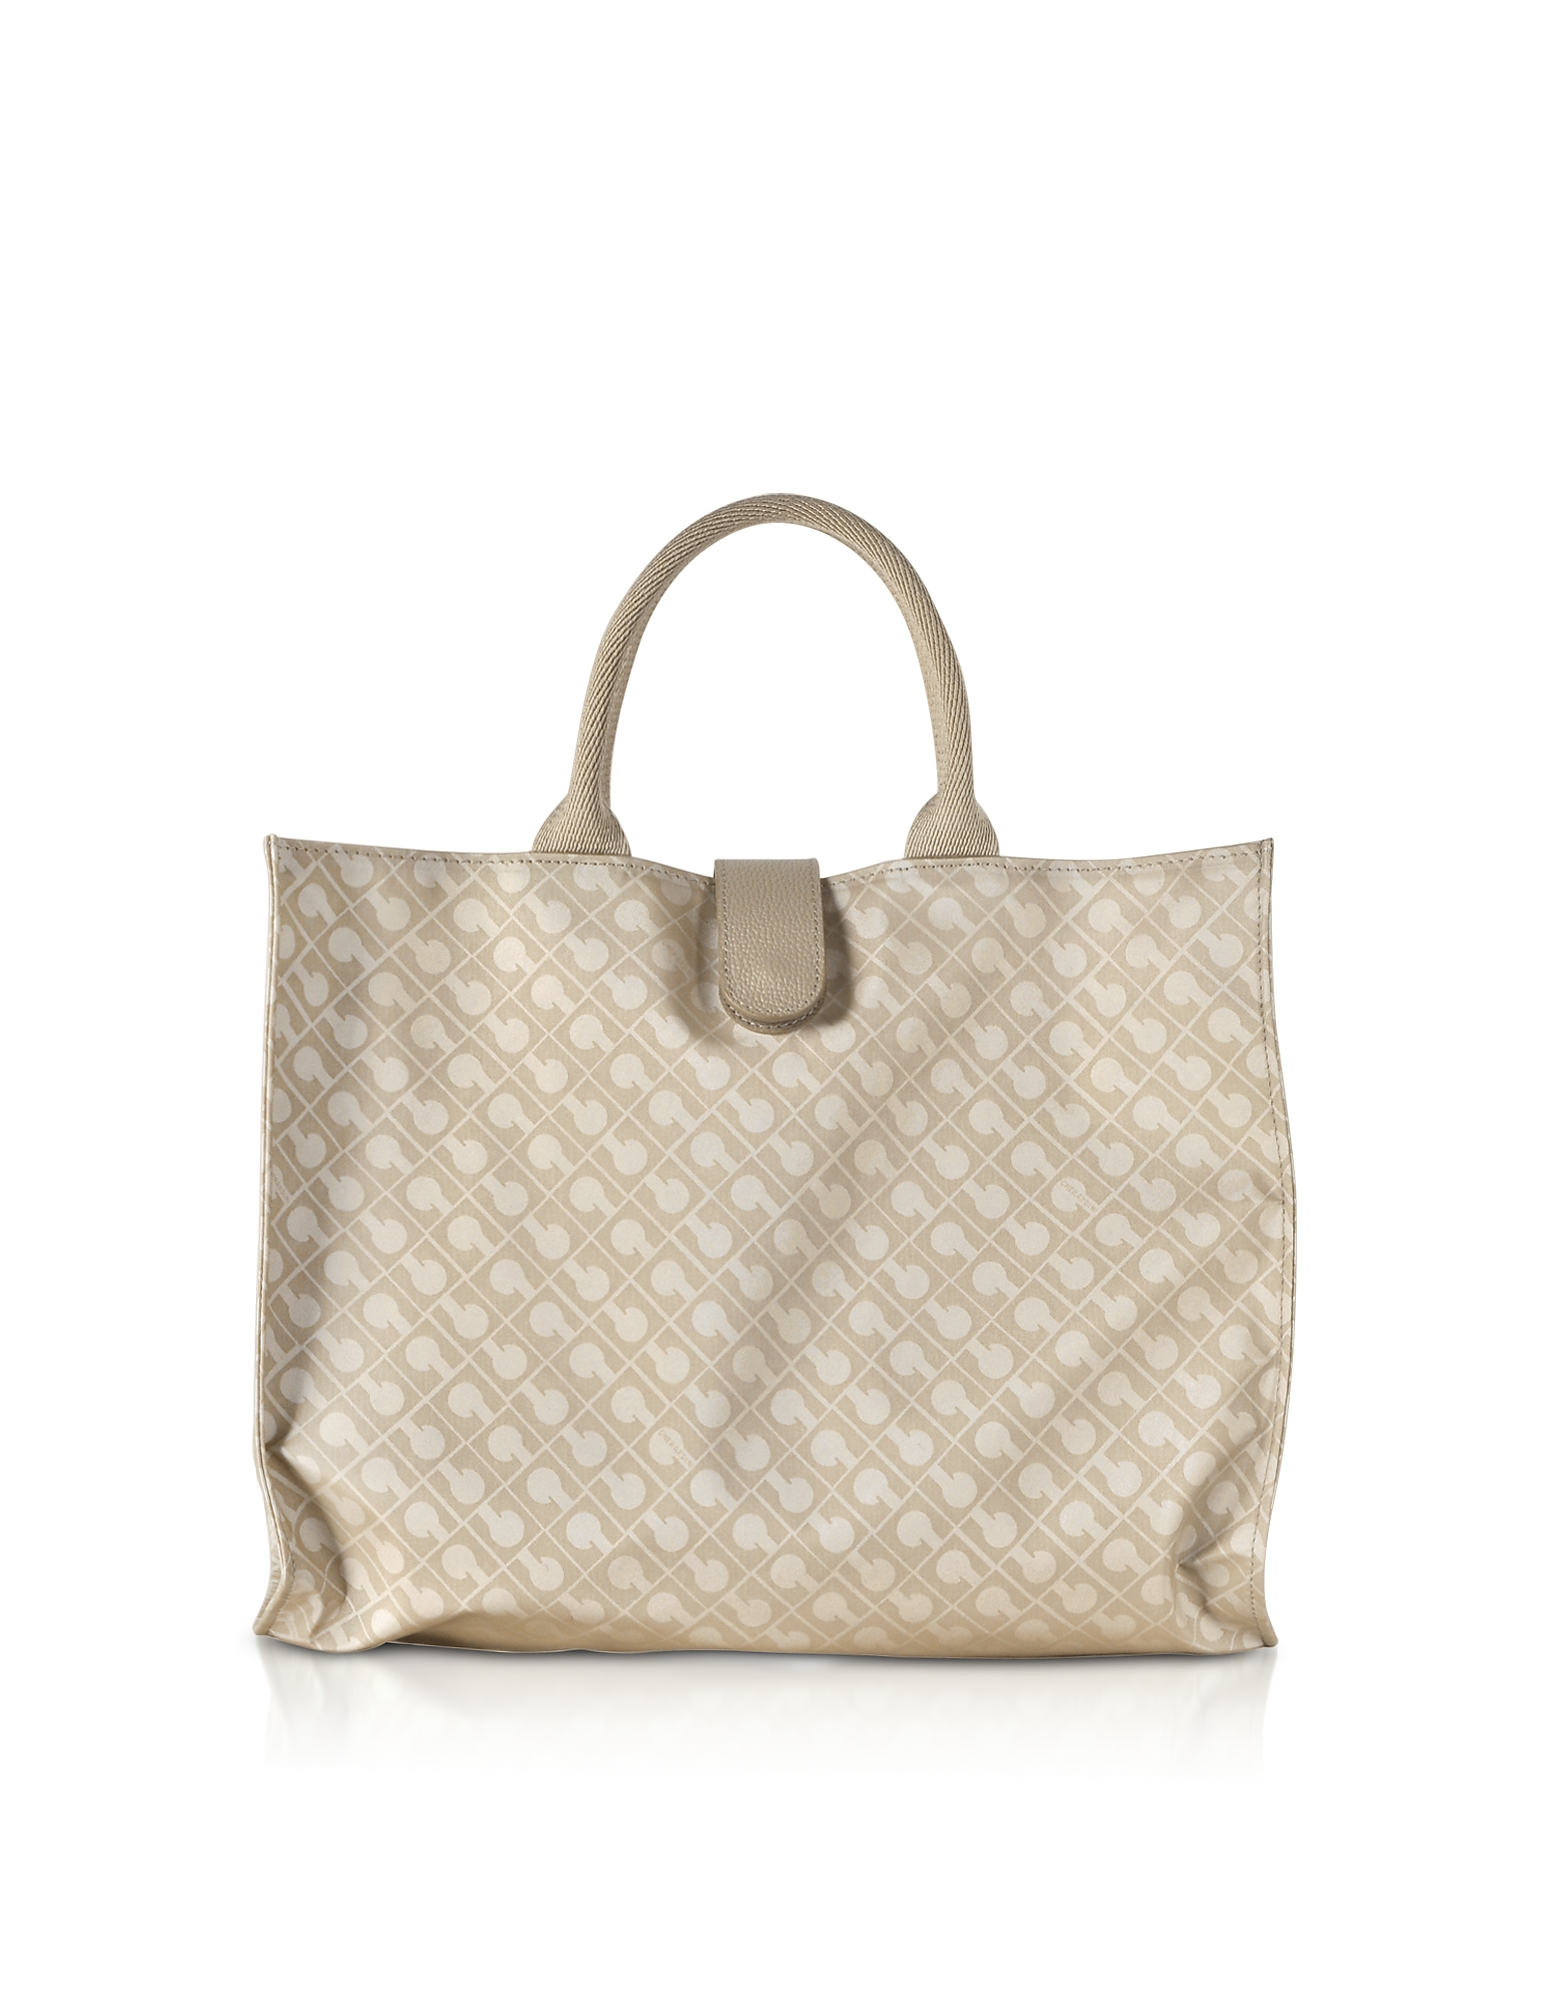 VIDA Tote Bag - LHIAN by VIDA VPCW2swg